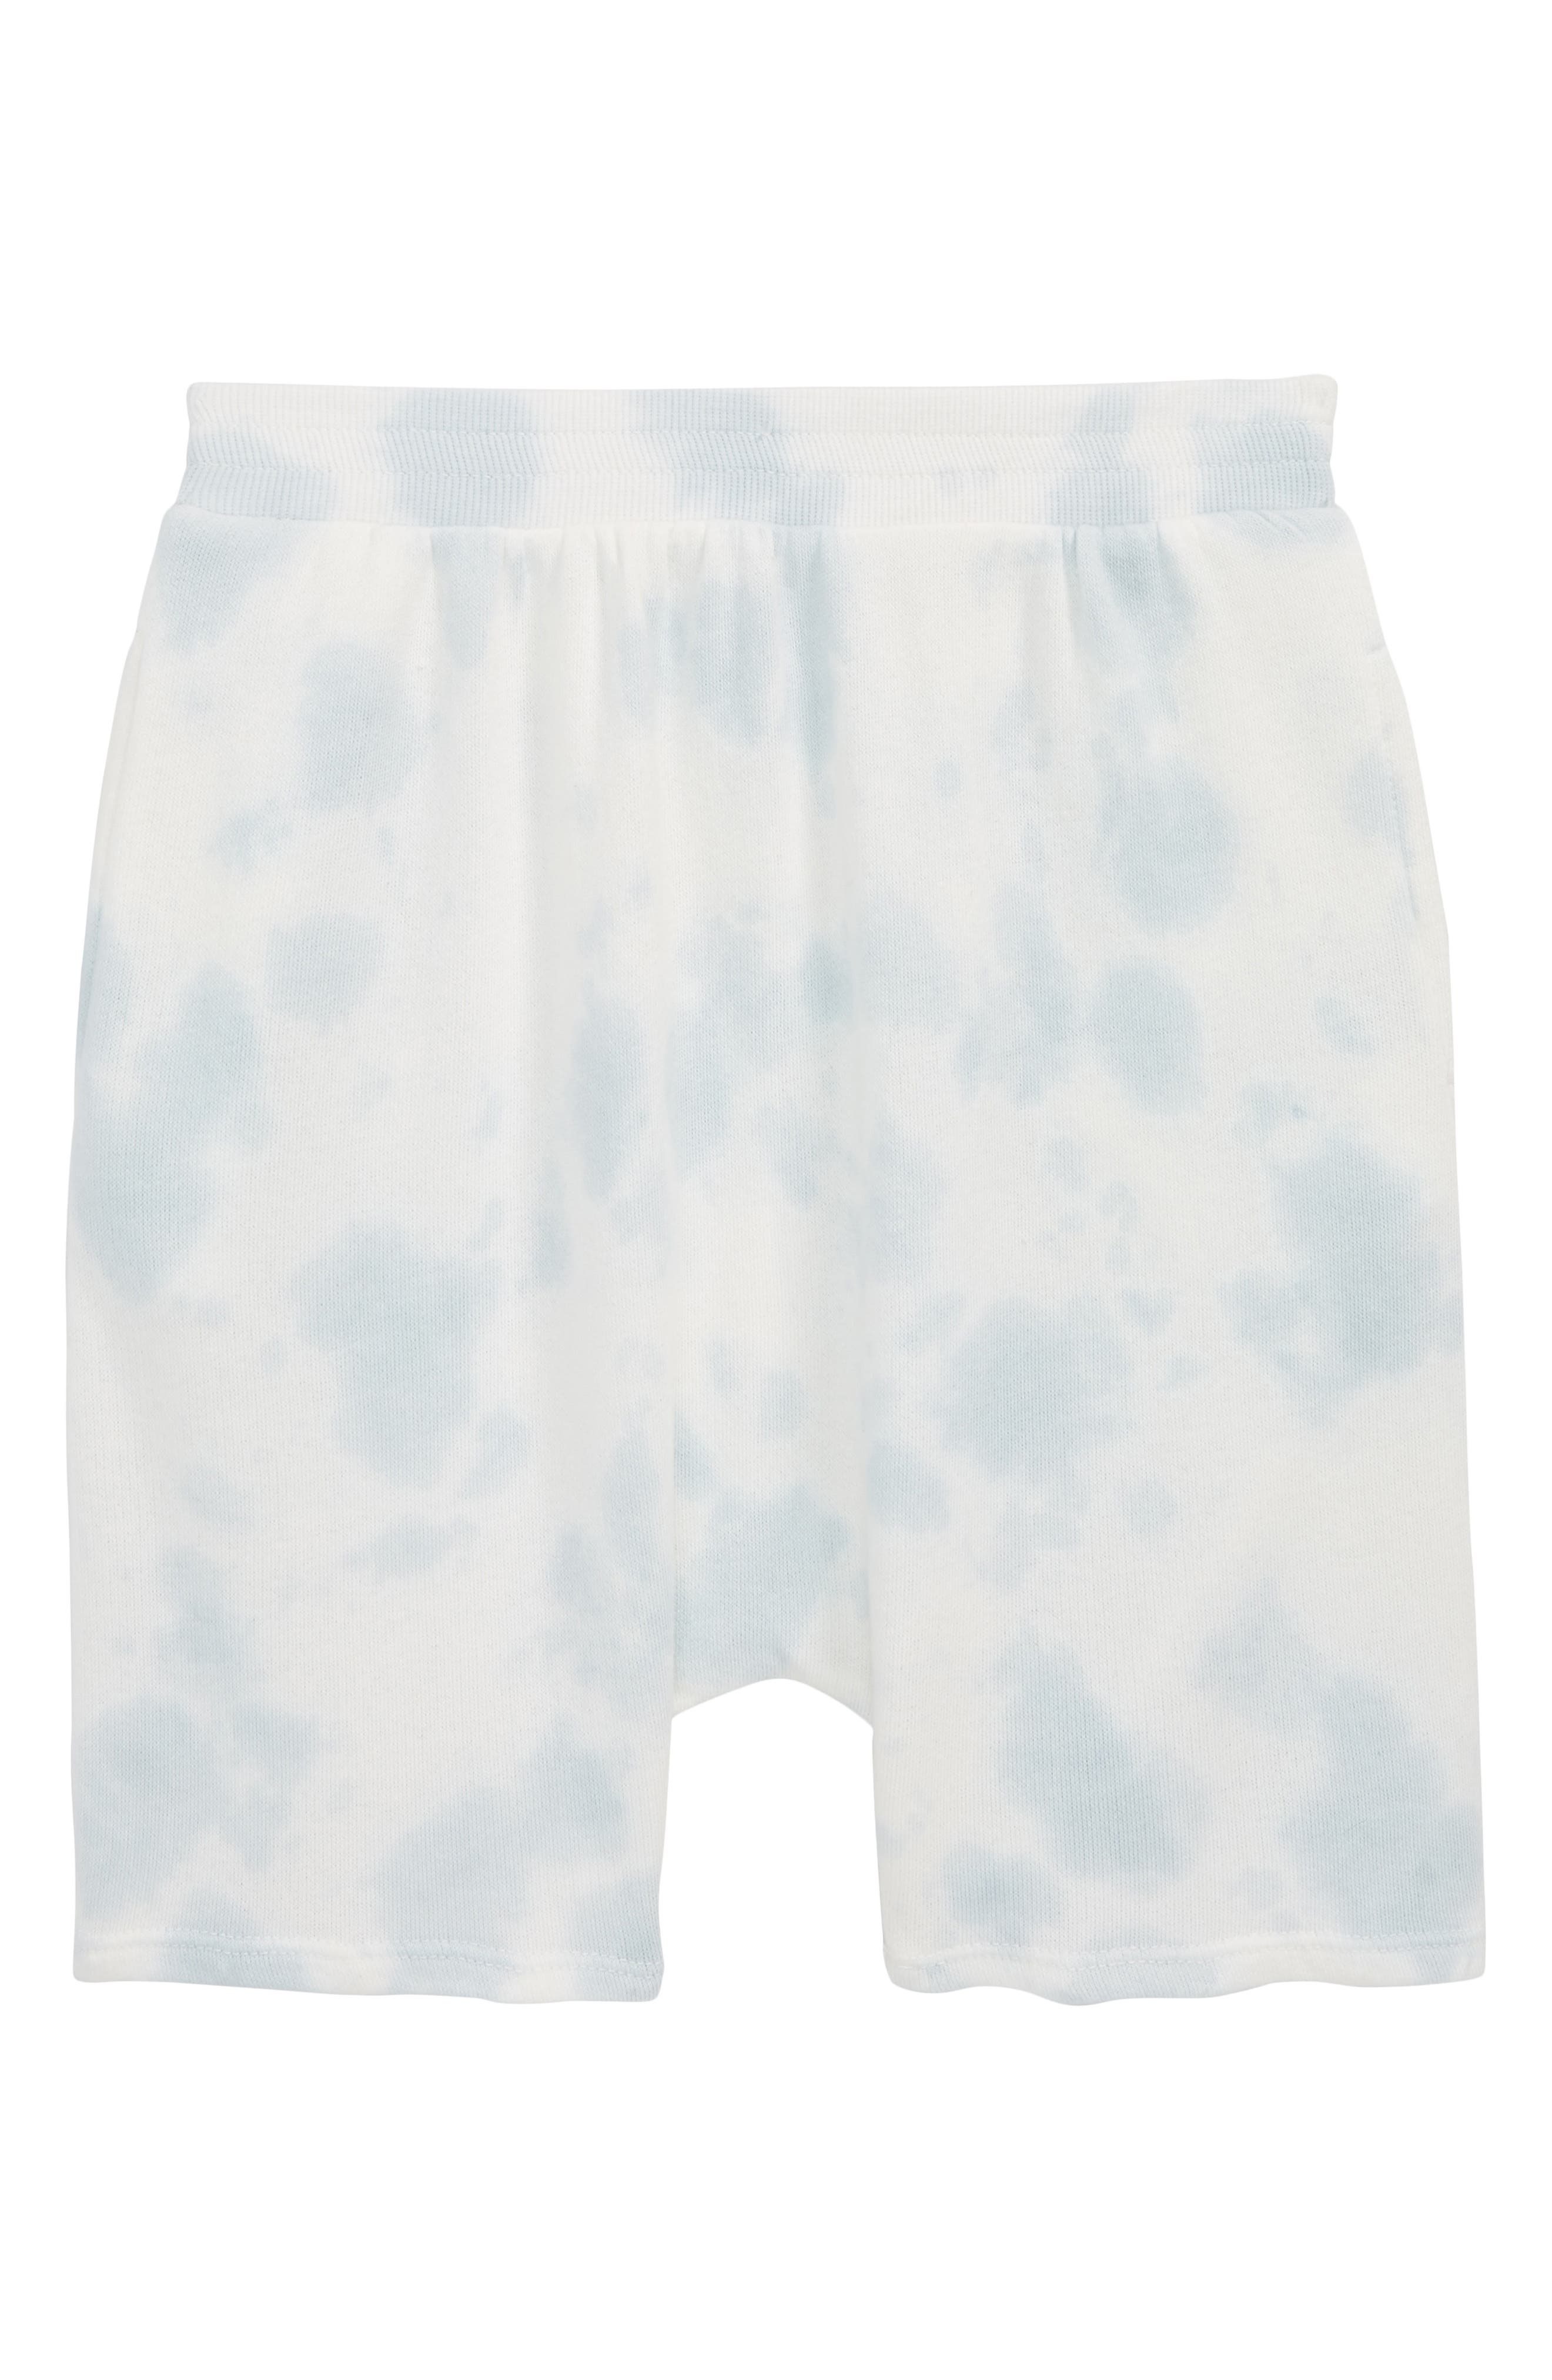 Alternate Image 1 Selected - Stem Tie Dye Shorts (Toddler Boys, Little Boys & Big Boys)